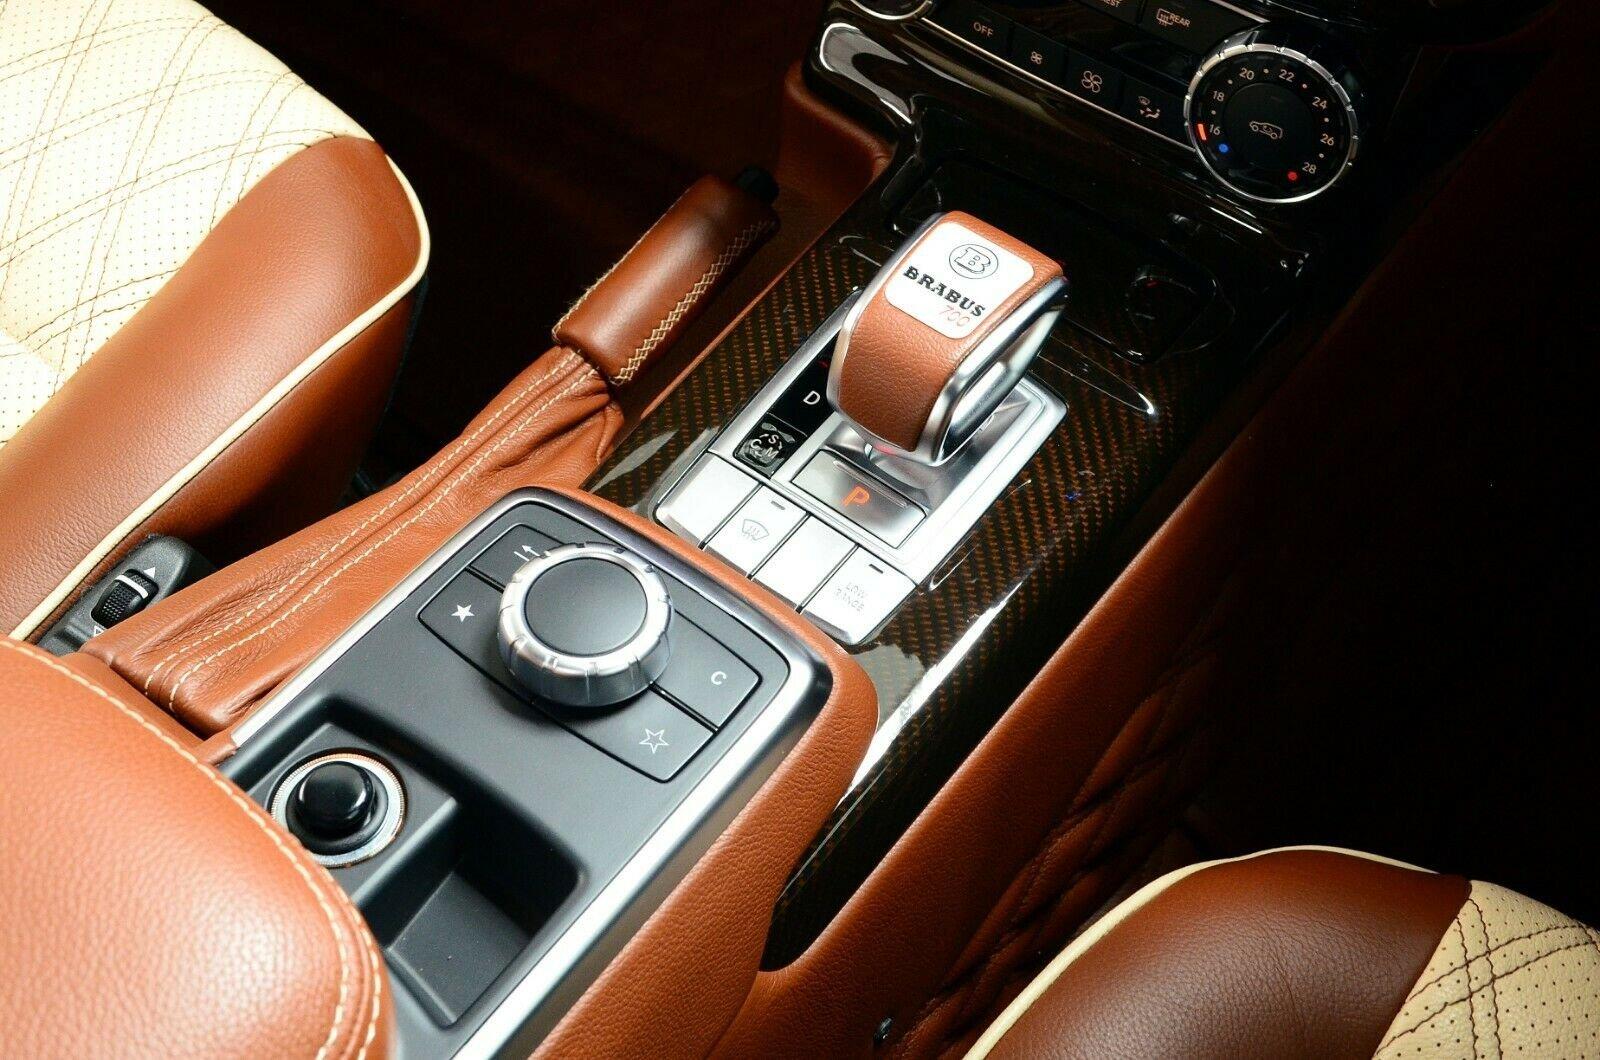 Mercedes-Benz G 63 AMG 6x6 Brabus700 - 1of15 (18)